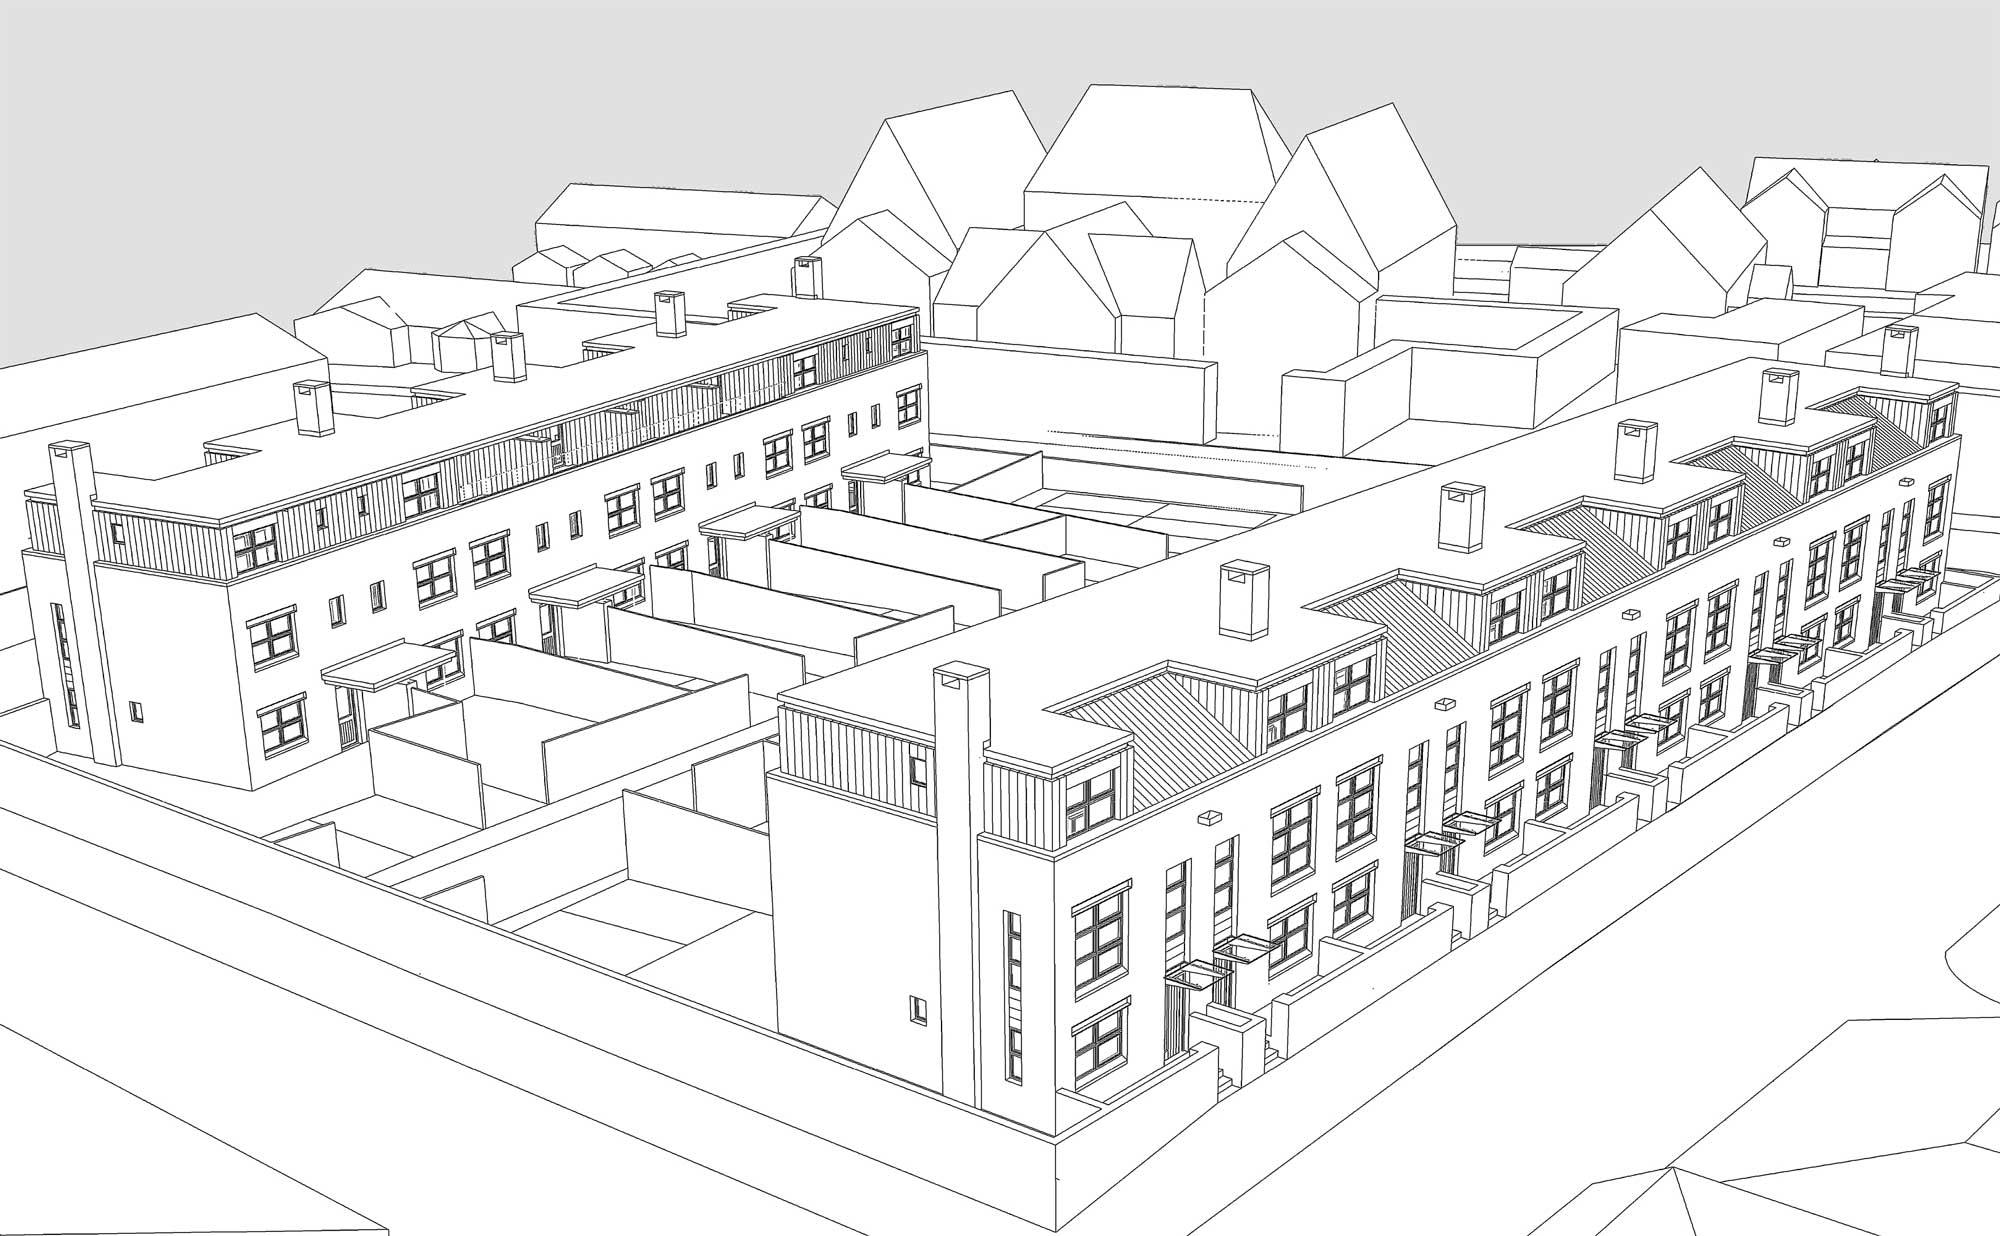 crewe social housing scheme sketch